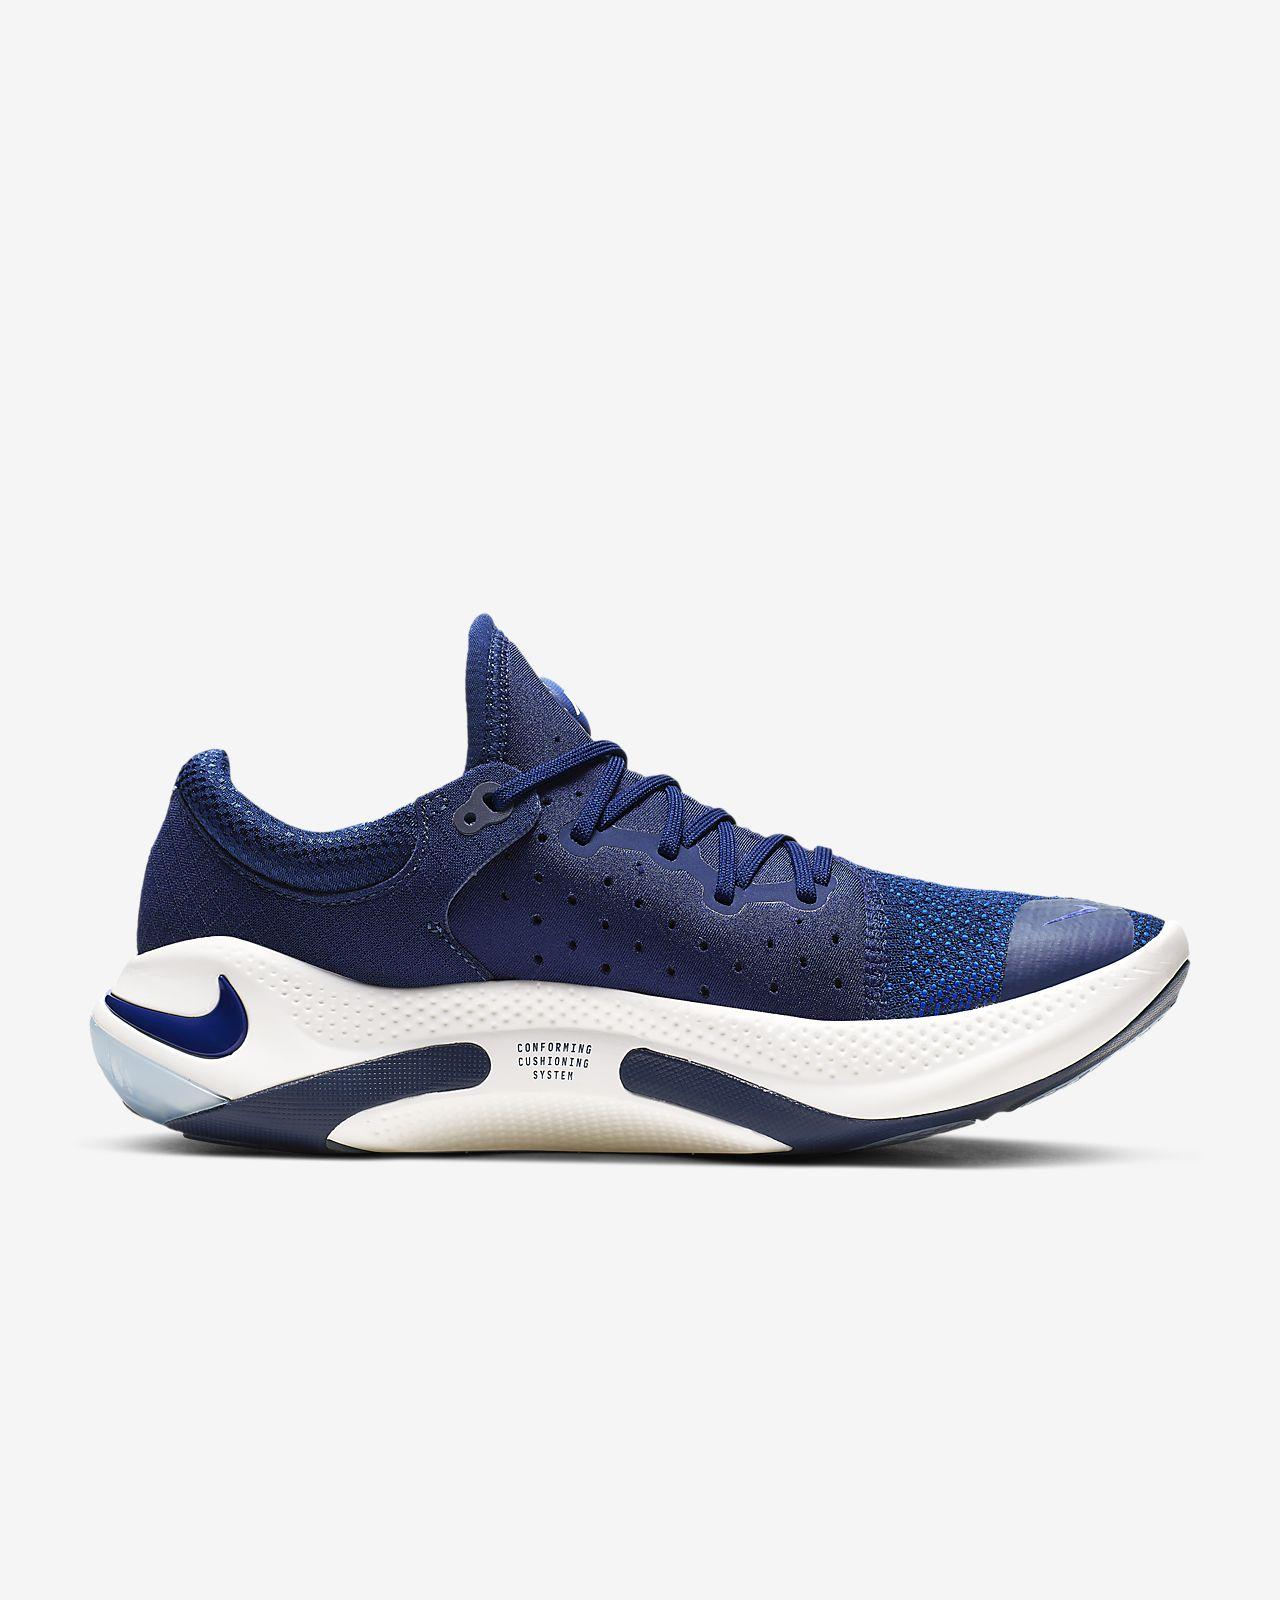 Nike Air Zoom Pegasus 35 Turbo whiteblue voidracer blue